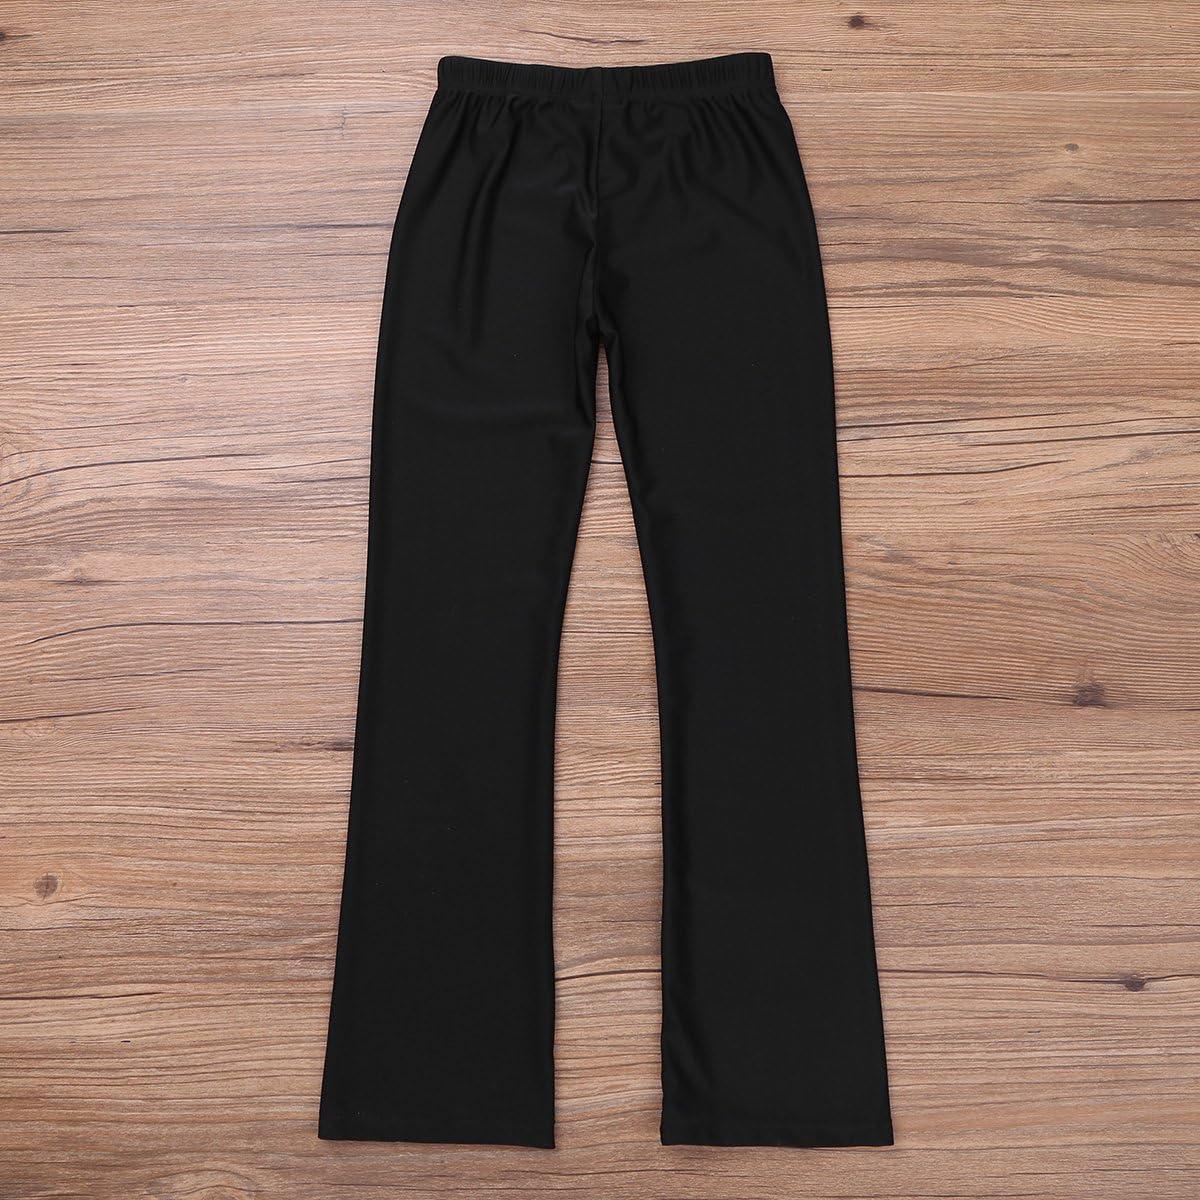 Choomomo Kids Girls Classic Long Pants Yoga Sports Gymnastic Workout Modern Dance Casual Daily Wear